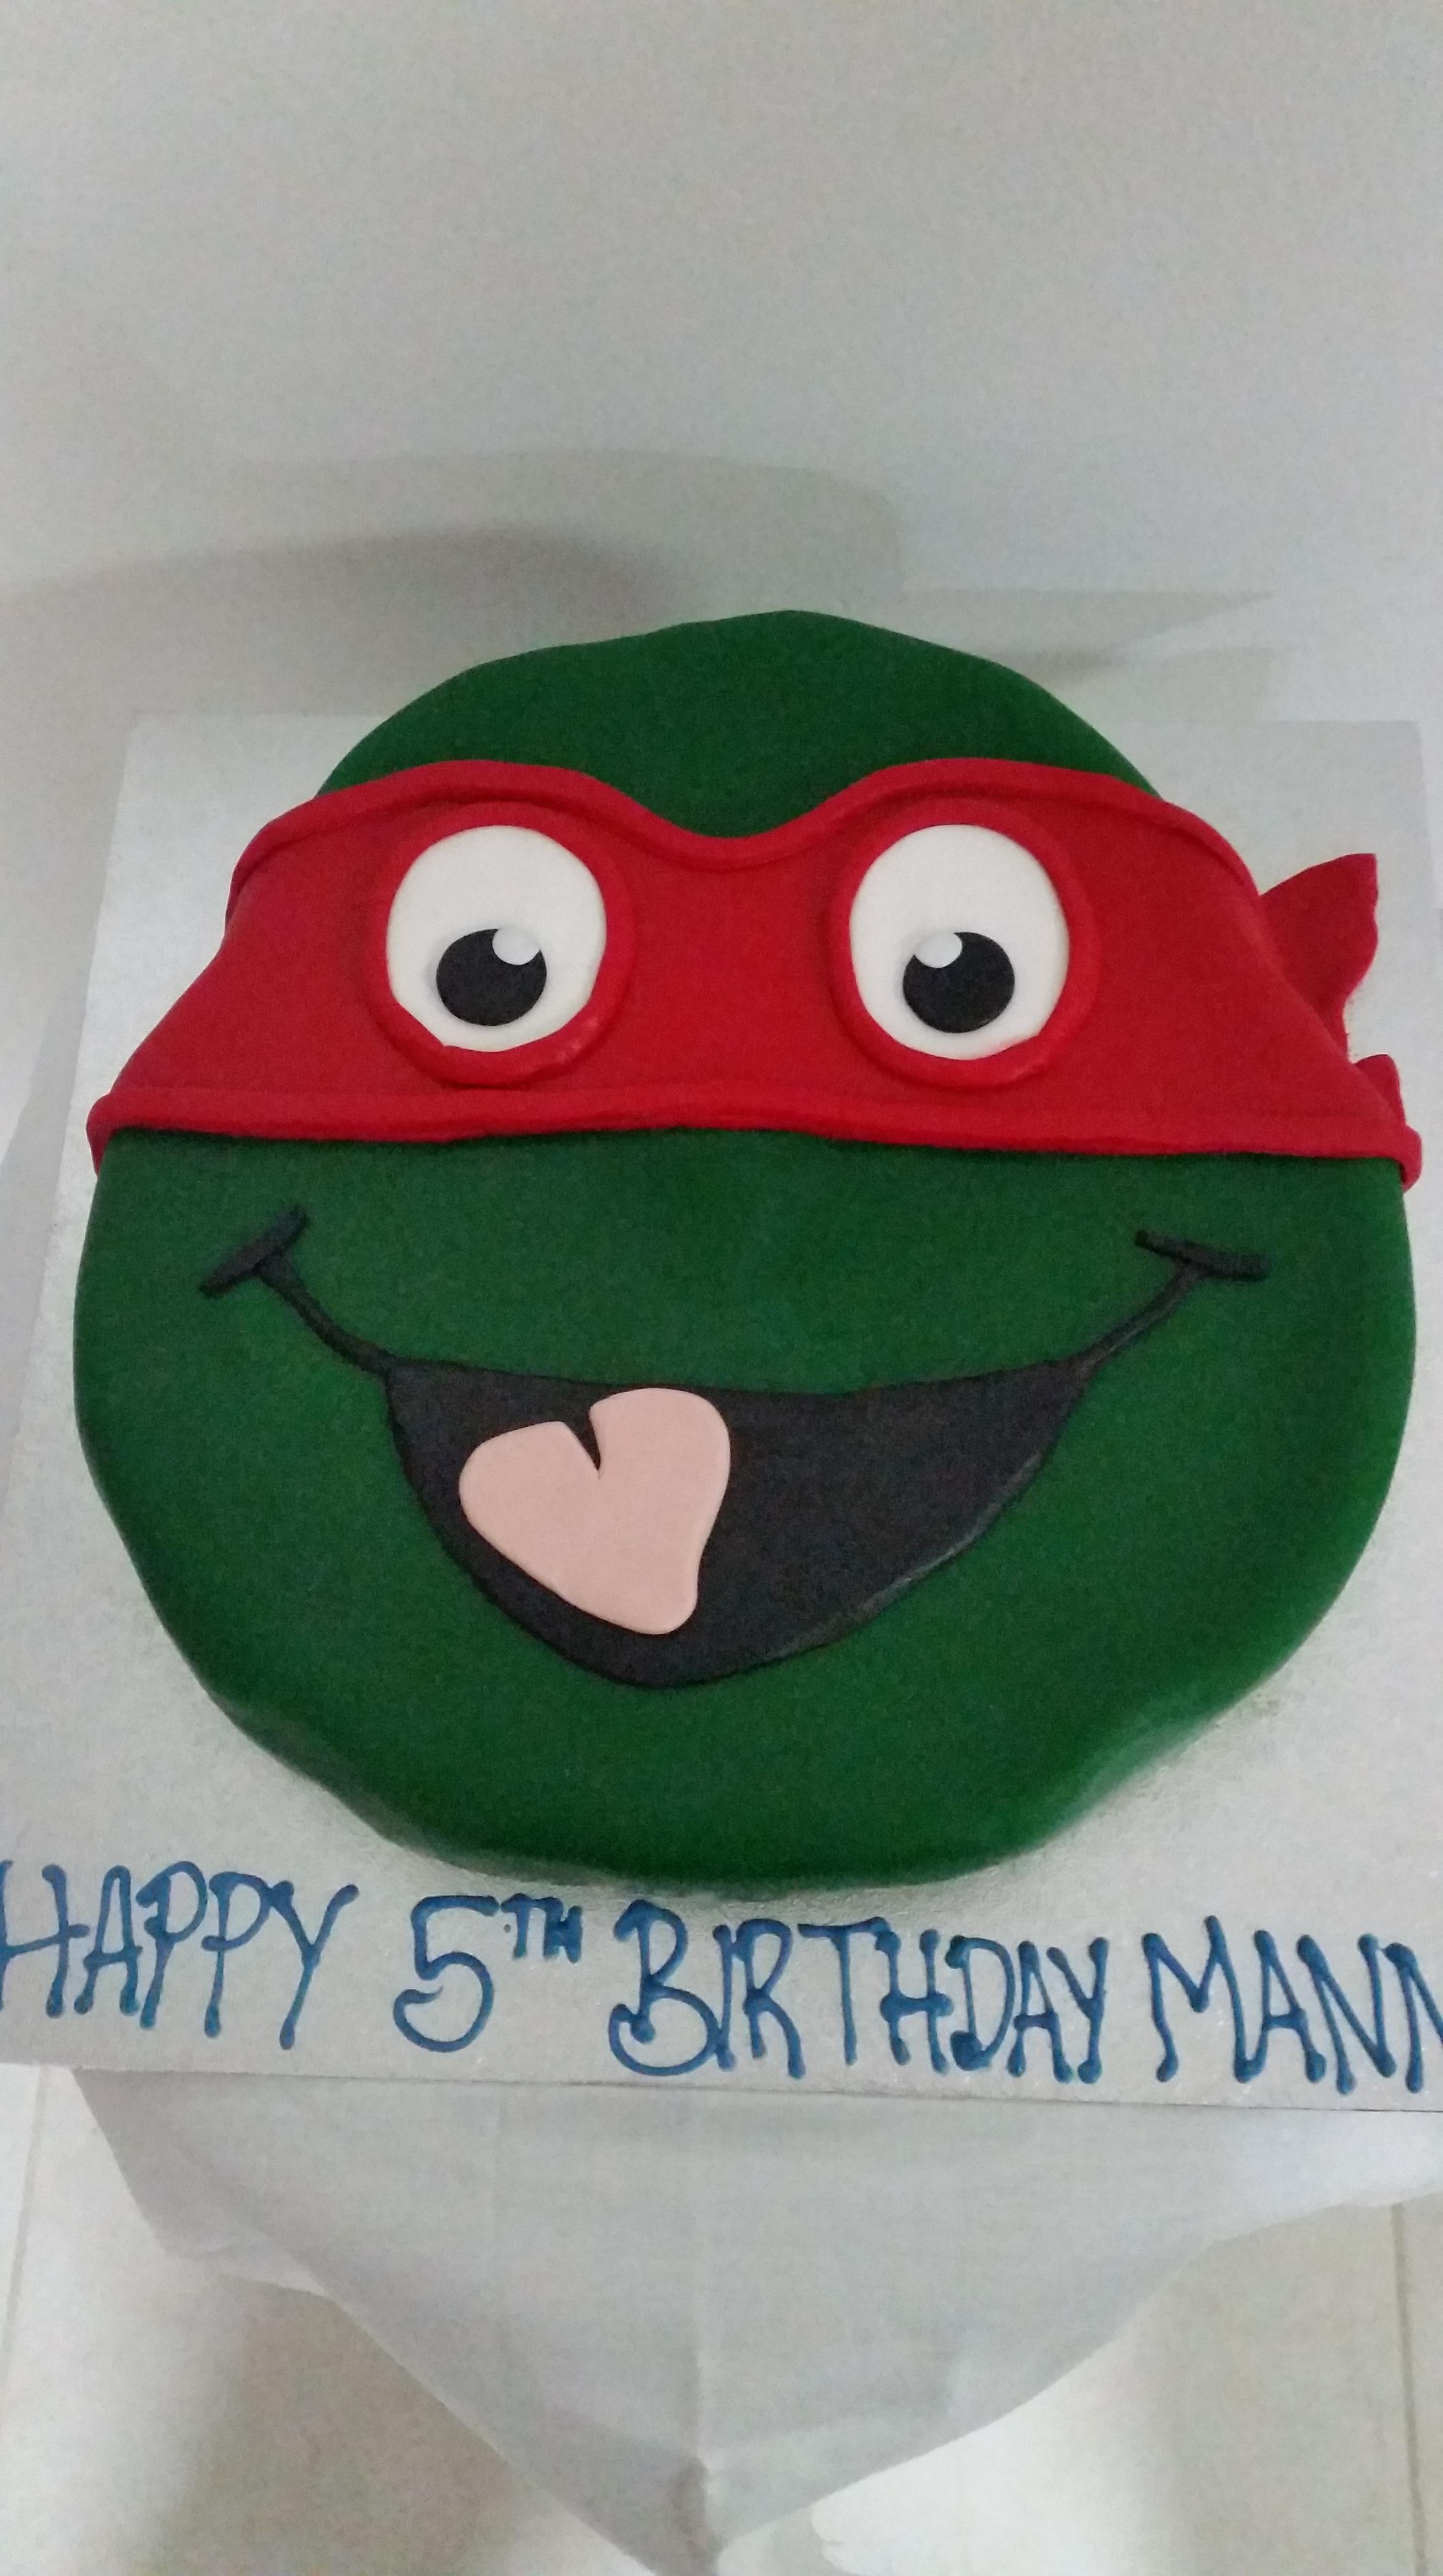 Novelty Birthday Cakes Perth